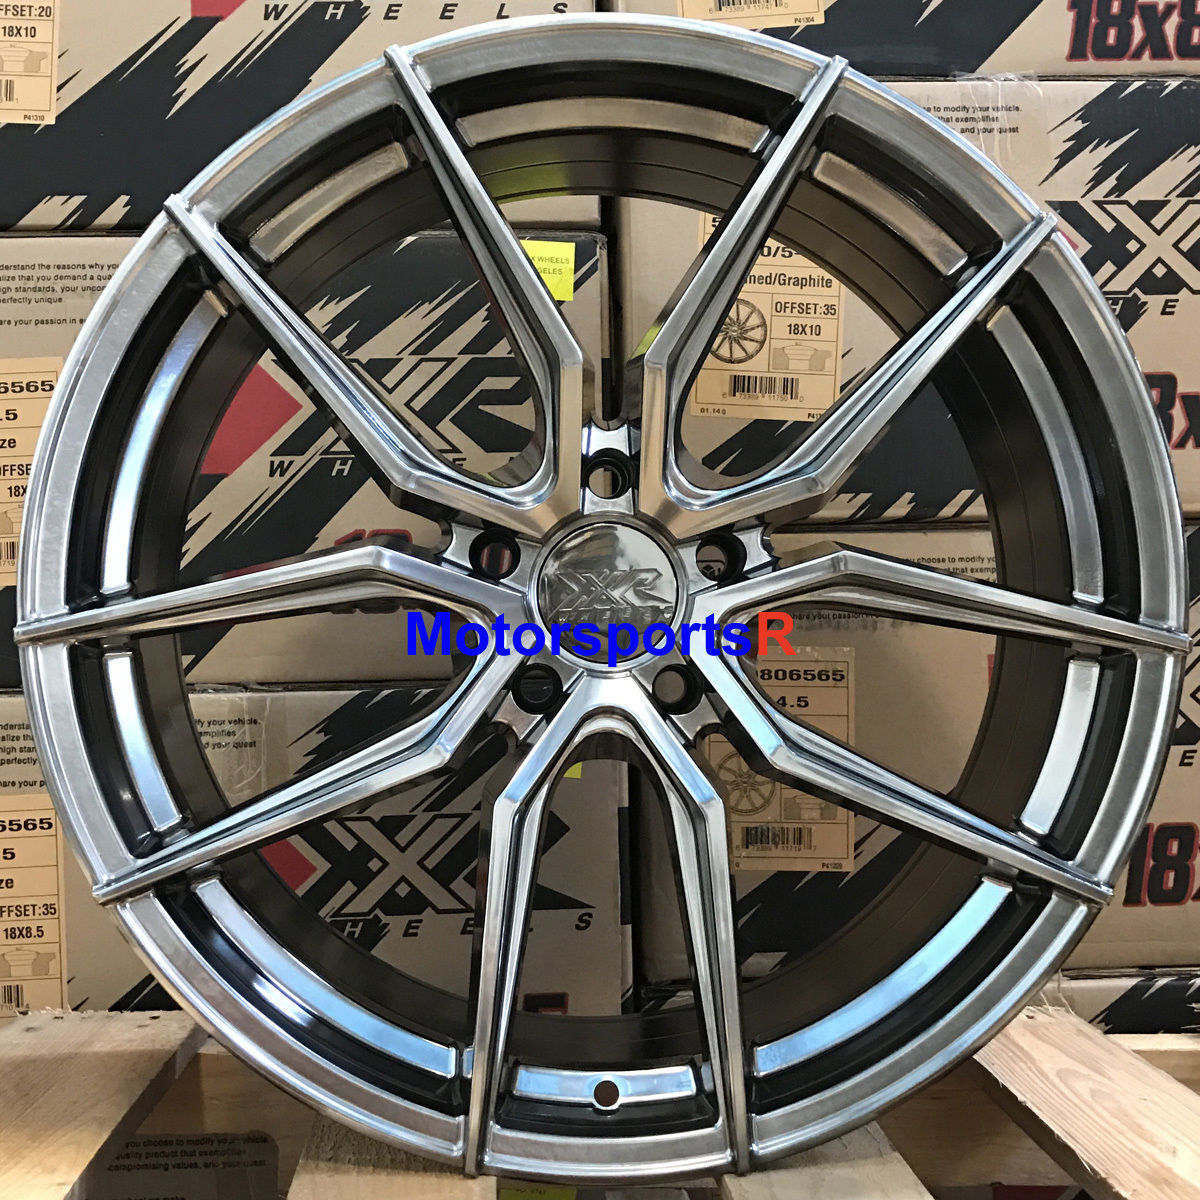 Details about XXR 559 Wheels 19 x 8 5 +40 Chromium Black Rim 5x4 5 09 Ford  Mustang GT Taurus z